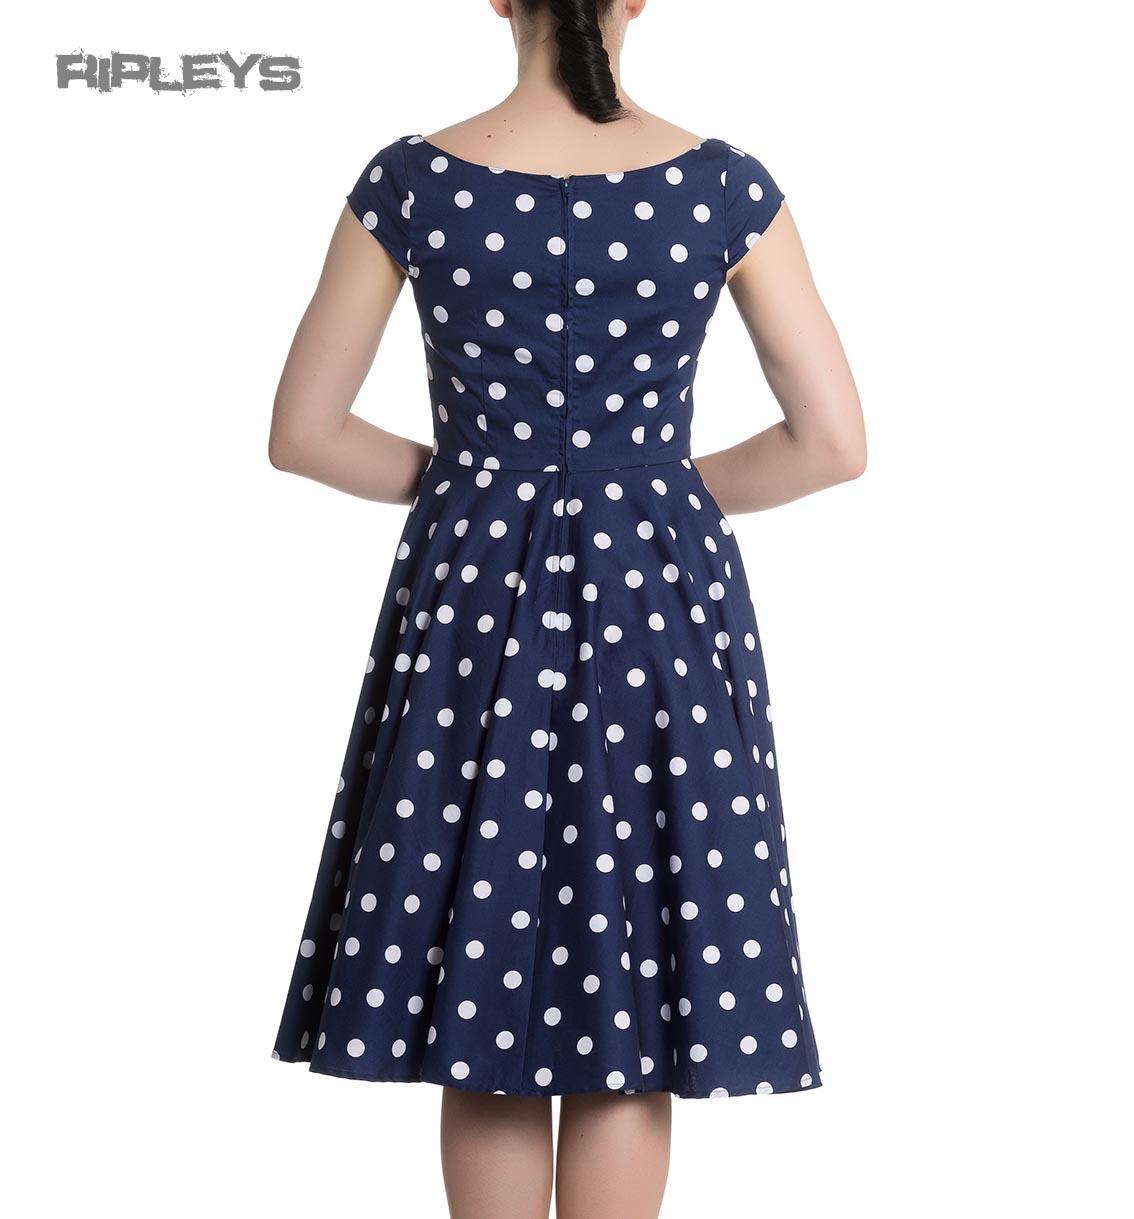 Hell-Bunny-50s-Dress-Polka-Dot-NICKY-Pin-Up-Rockabilly-Navy-Blue-All-Sizes thumbnail 12